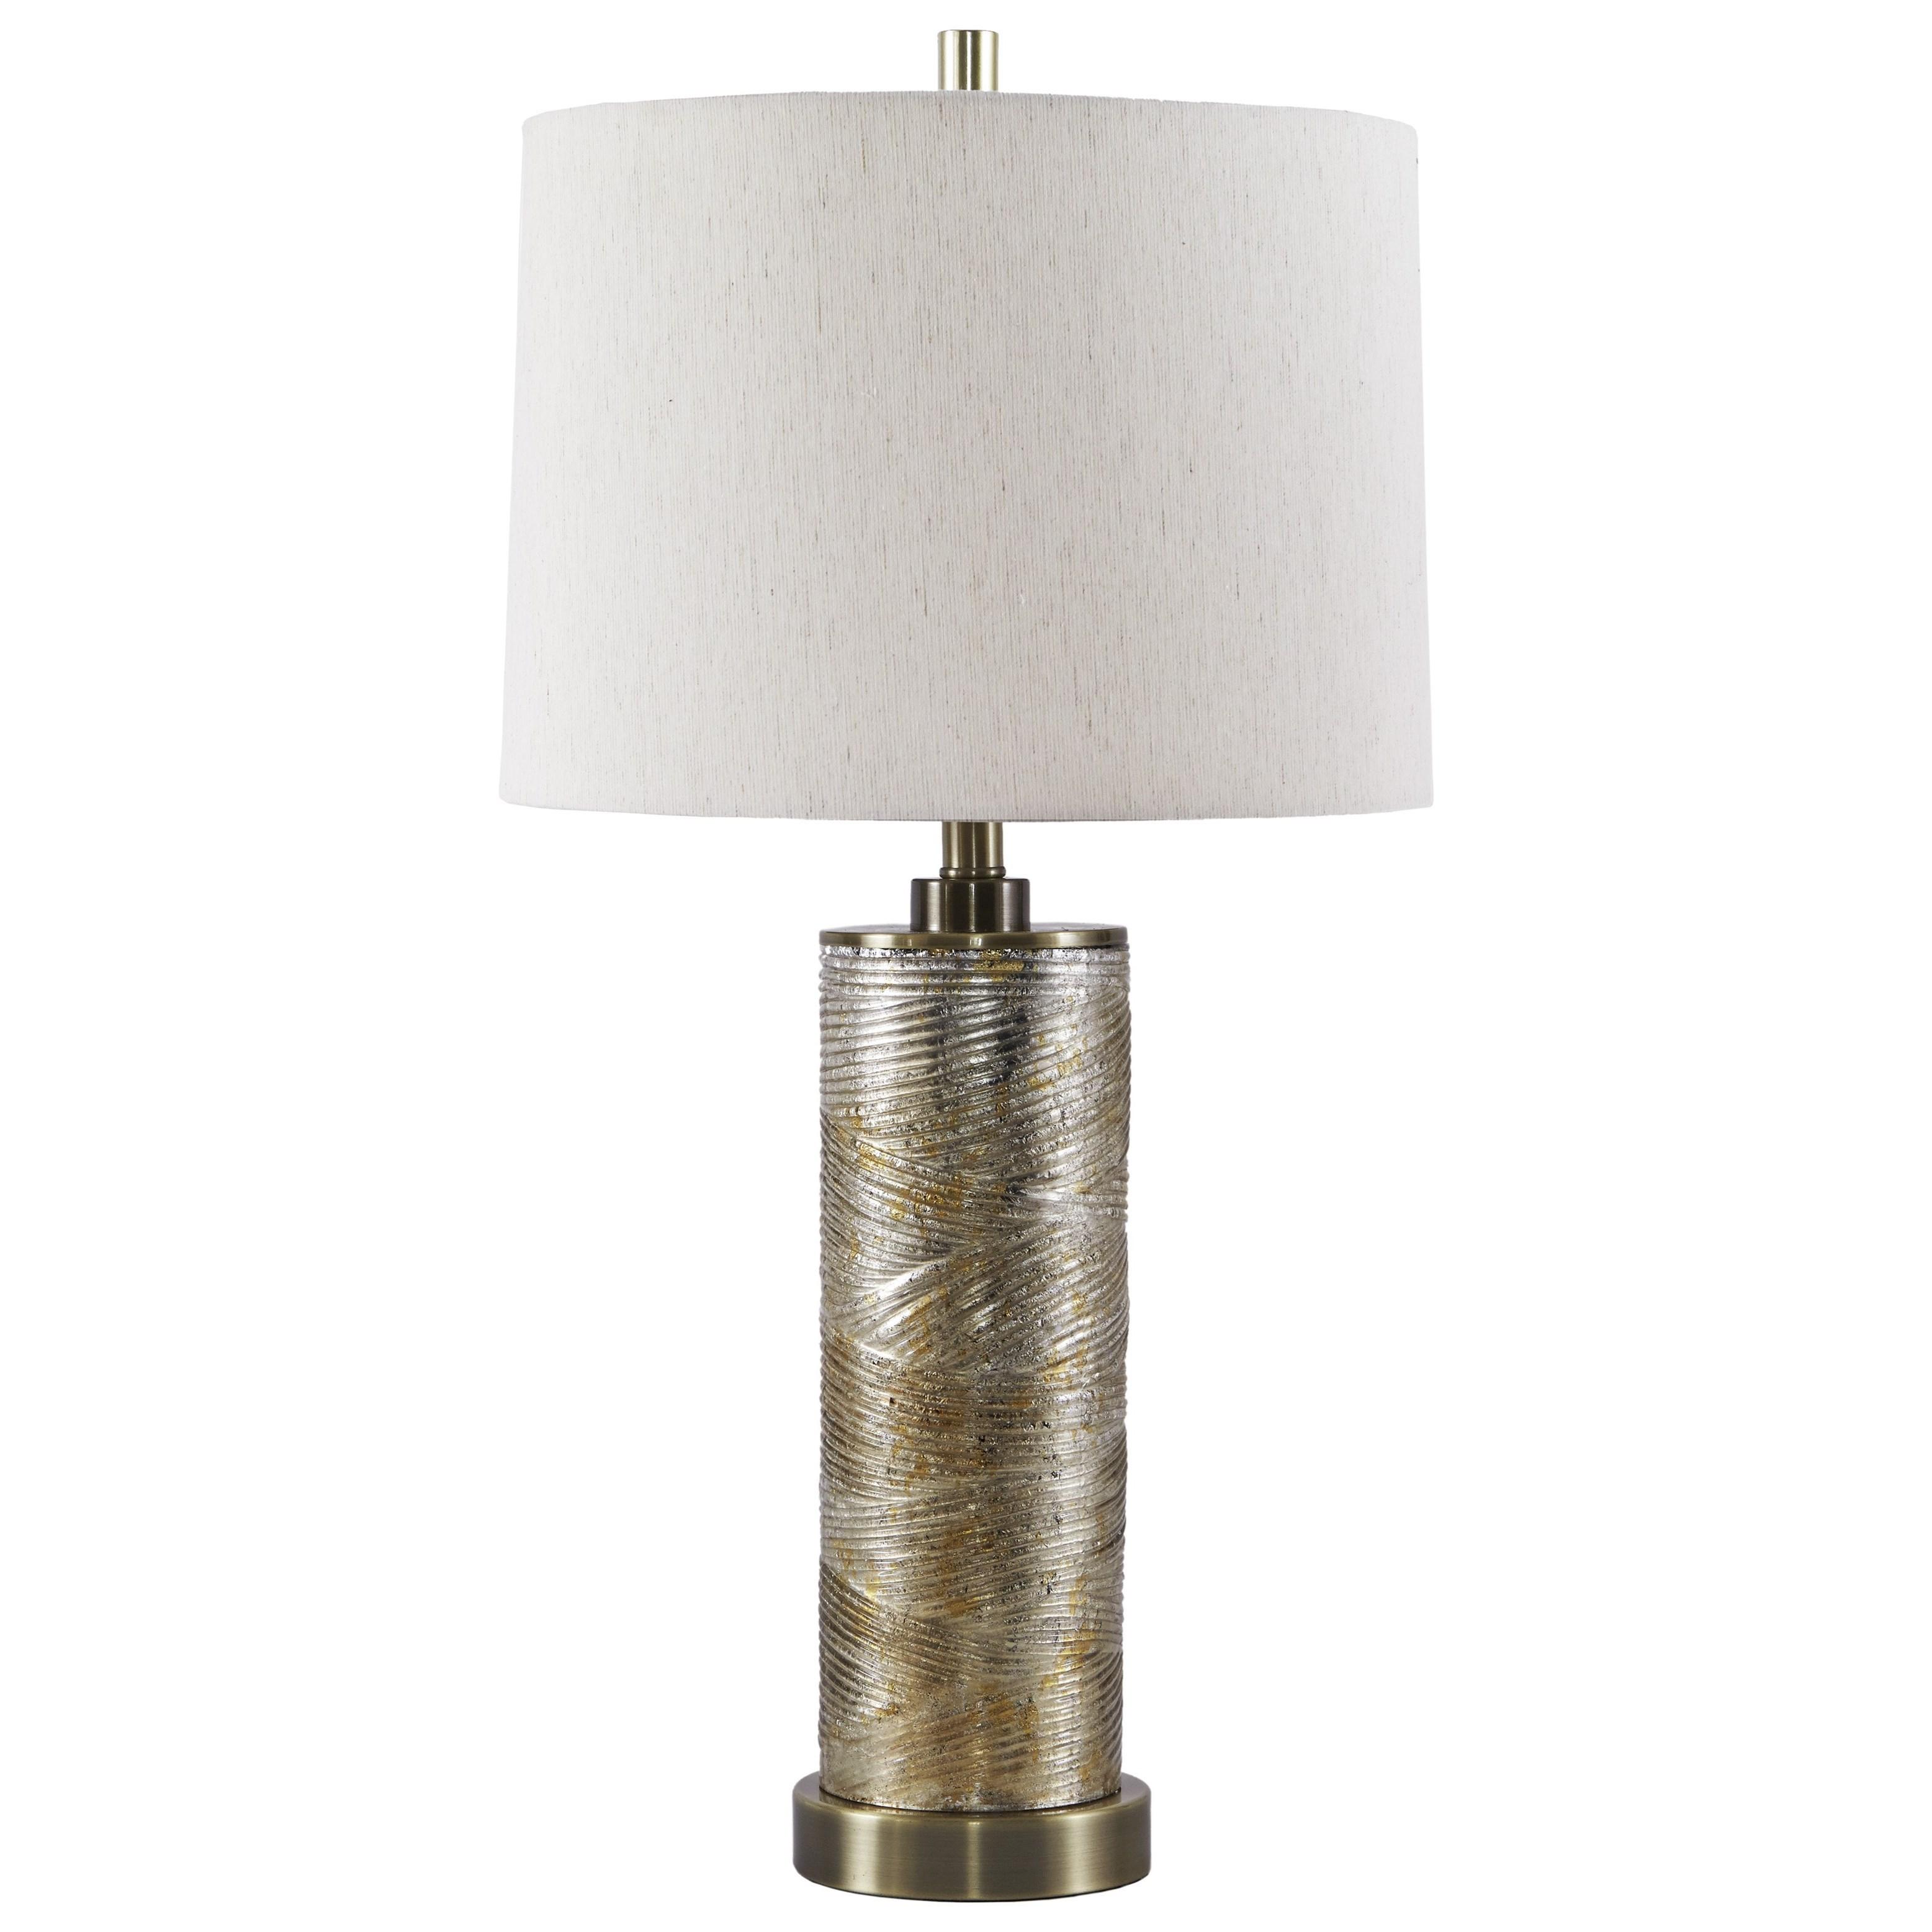 Signature Design By Ashley Lamps   ContemporaryFarrar Gold Finish Glass  Table Lamp ...